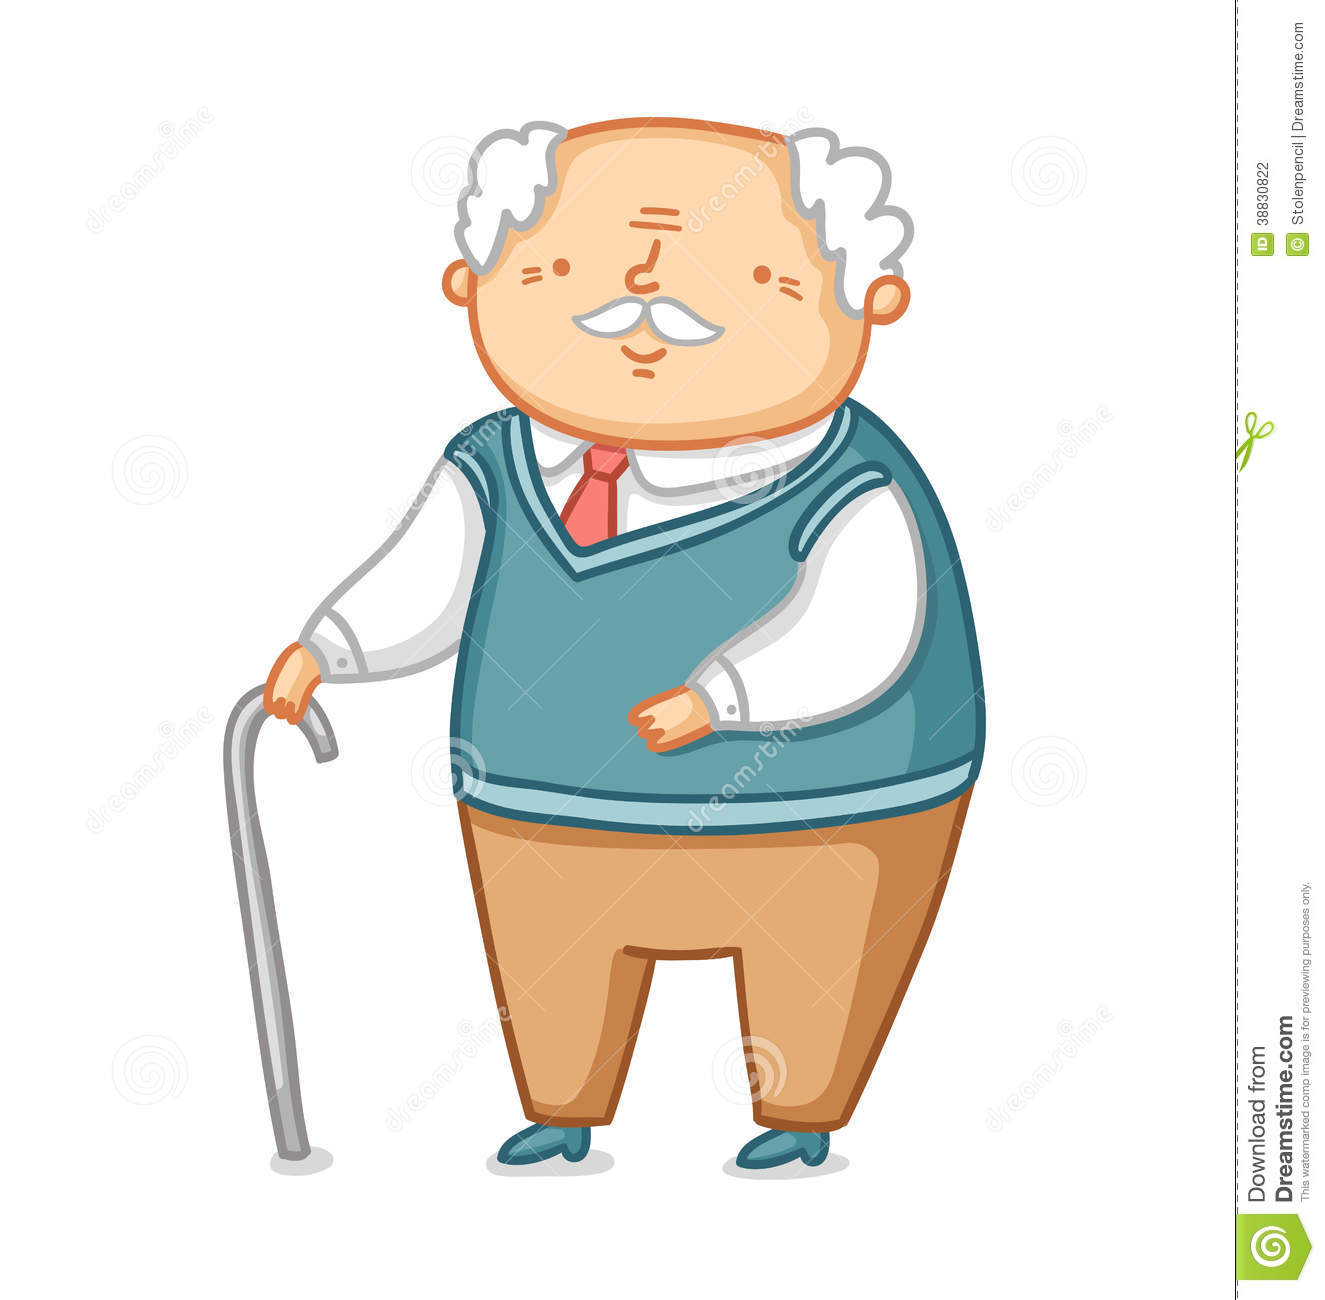 Grandpa Clipart & Grandpa Clip Art Images.